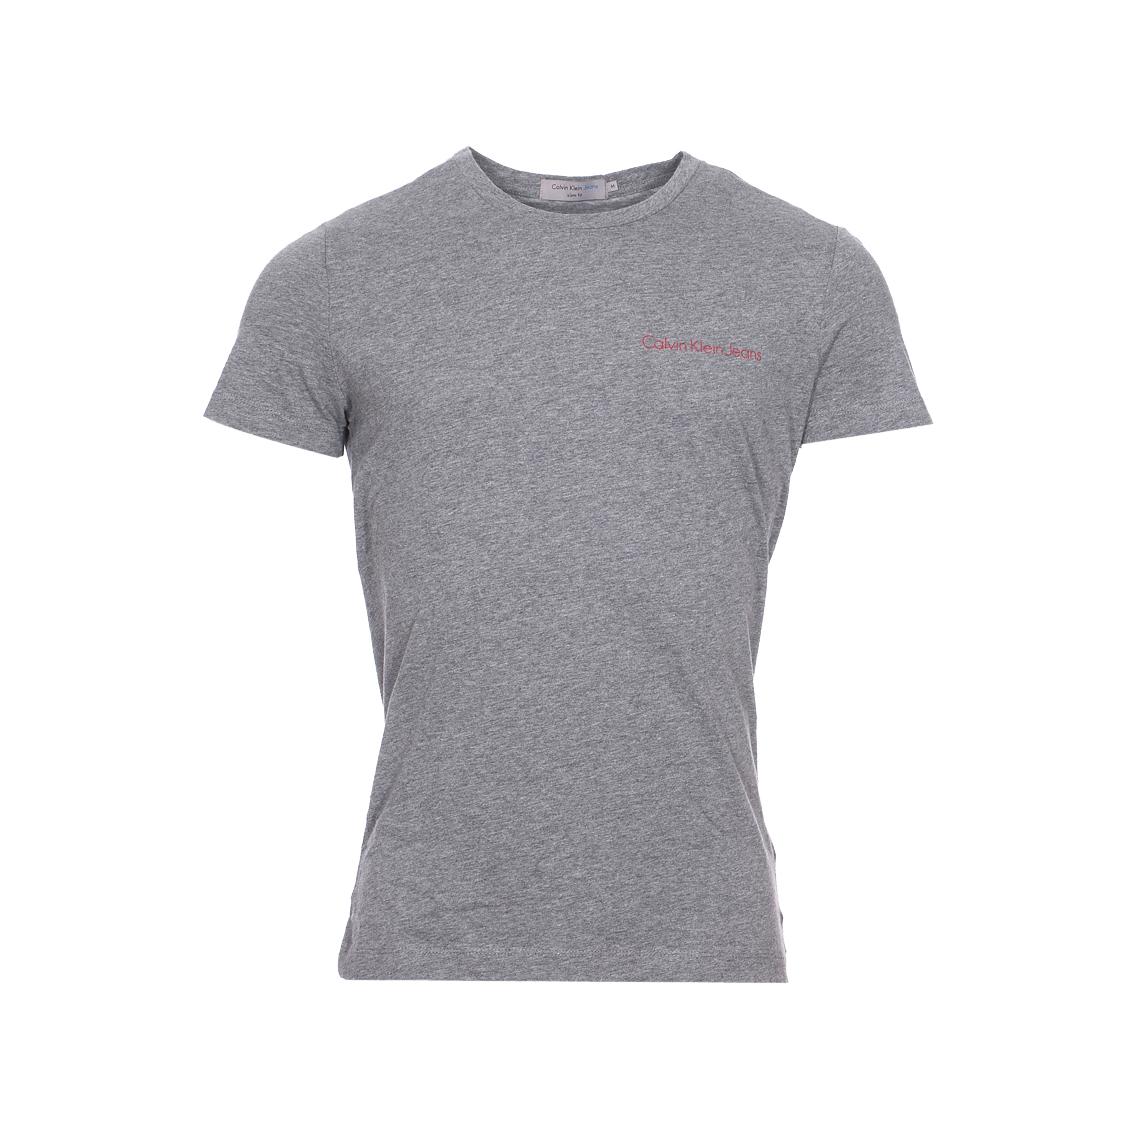 Tee-shirt col rond  typoko en coton gris chiné floqué